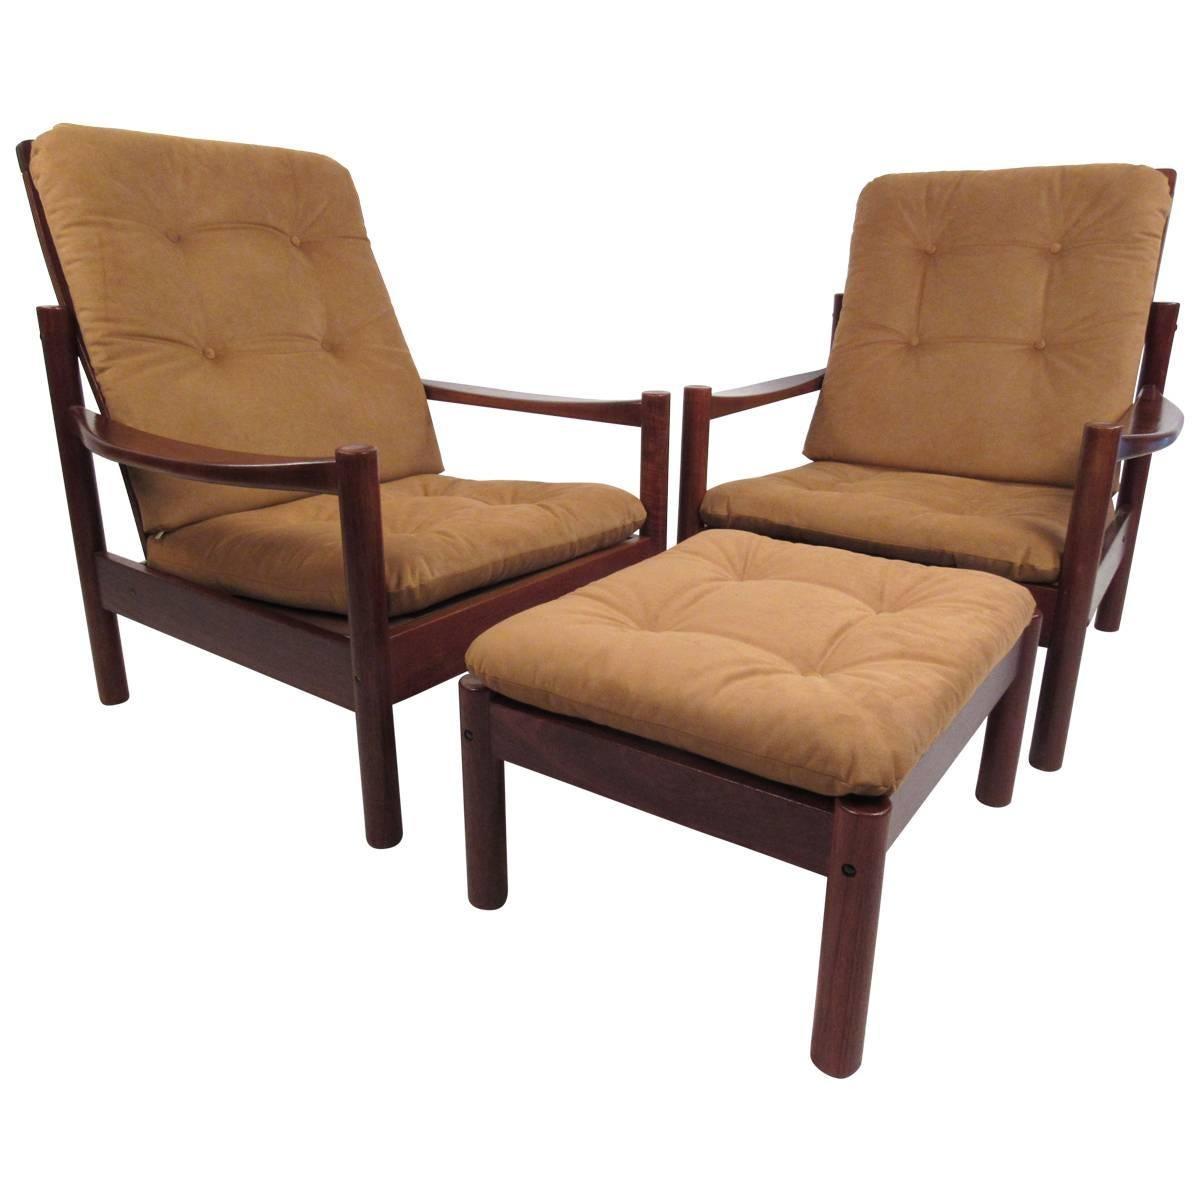 Pair Mid-Century Style Danish Teak Lounge Chairs with Ottoman